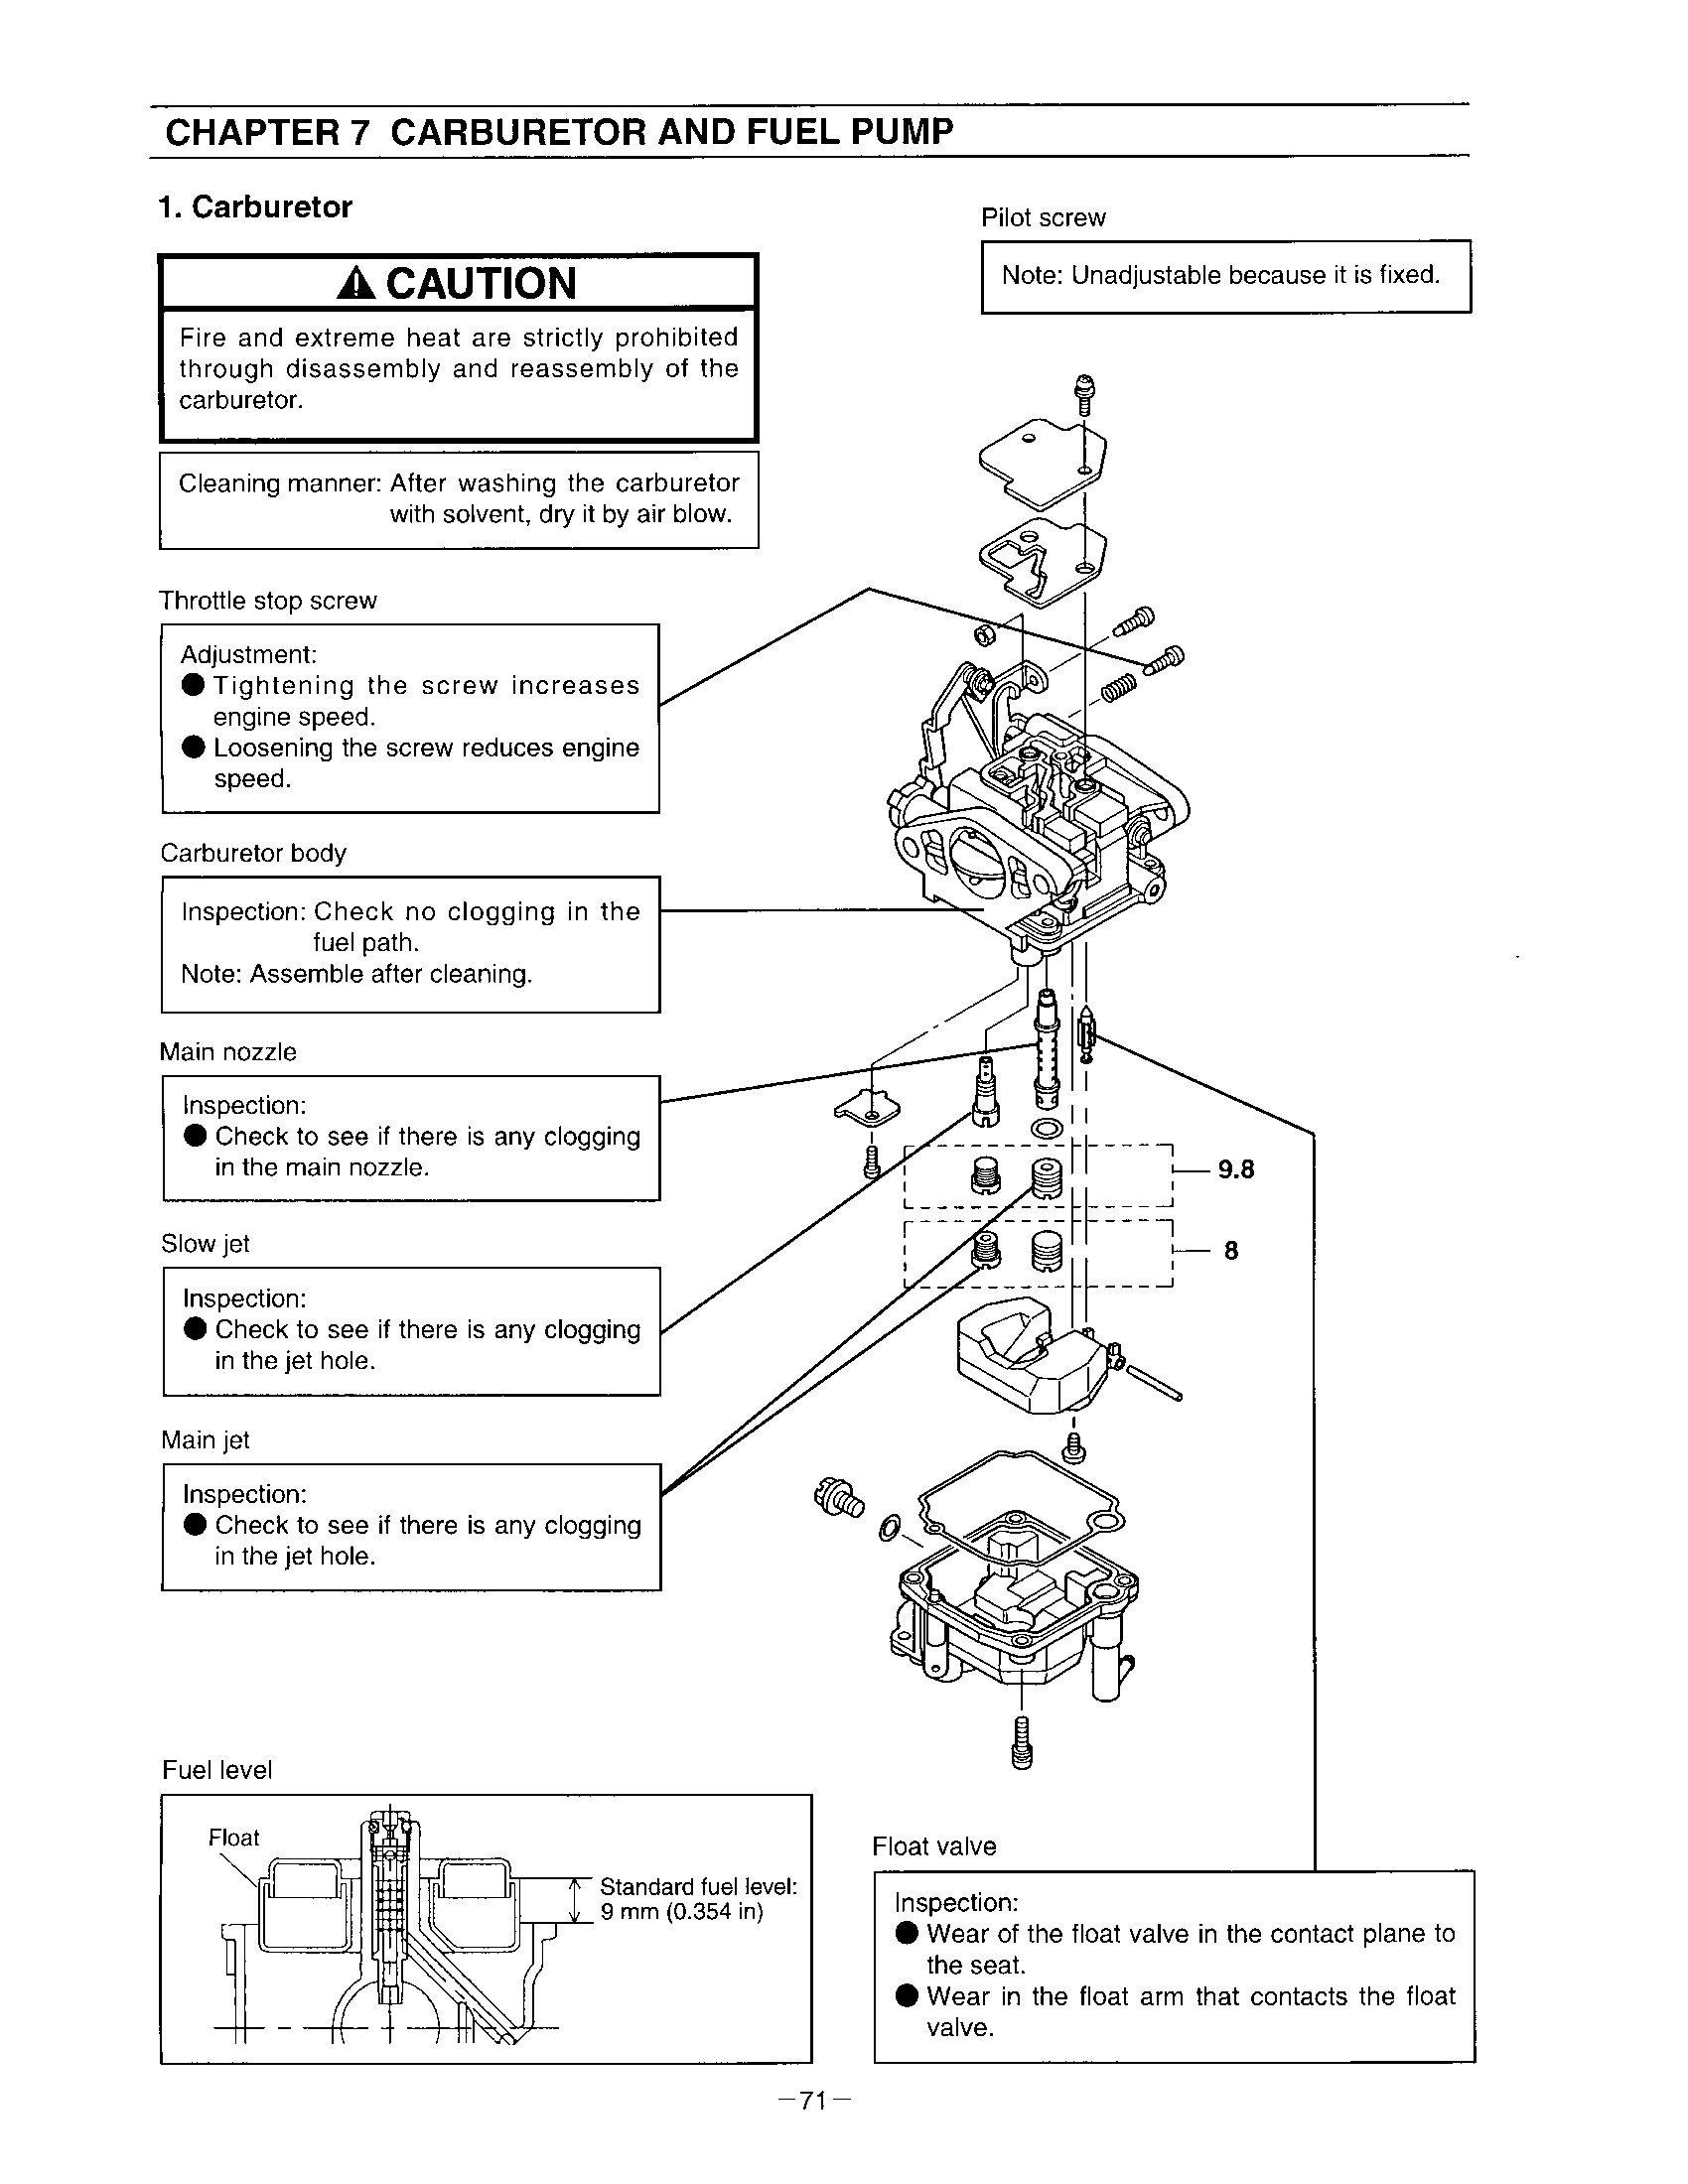 40 hp mercury outboard 4 stroke problems autos post. Black Bedroom Furniture Sets. Home Design Ideas